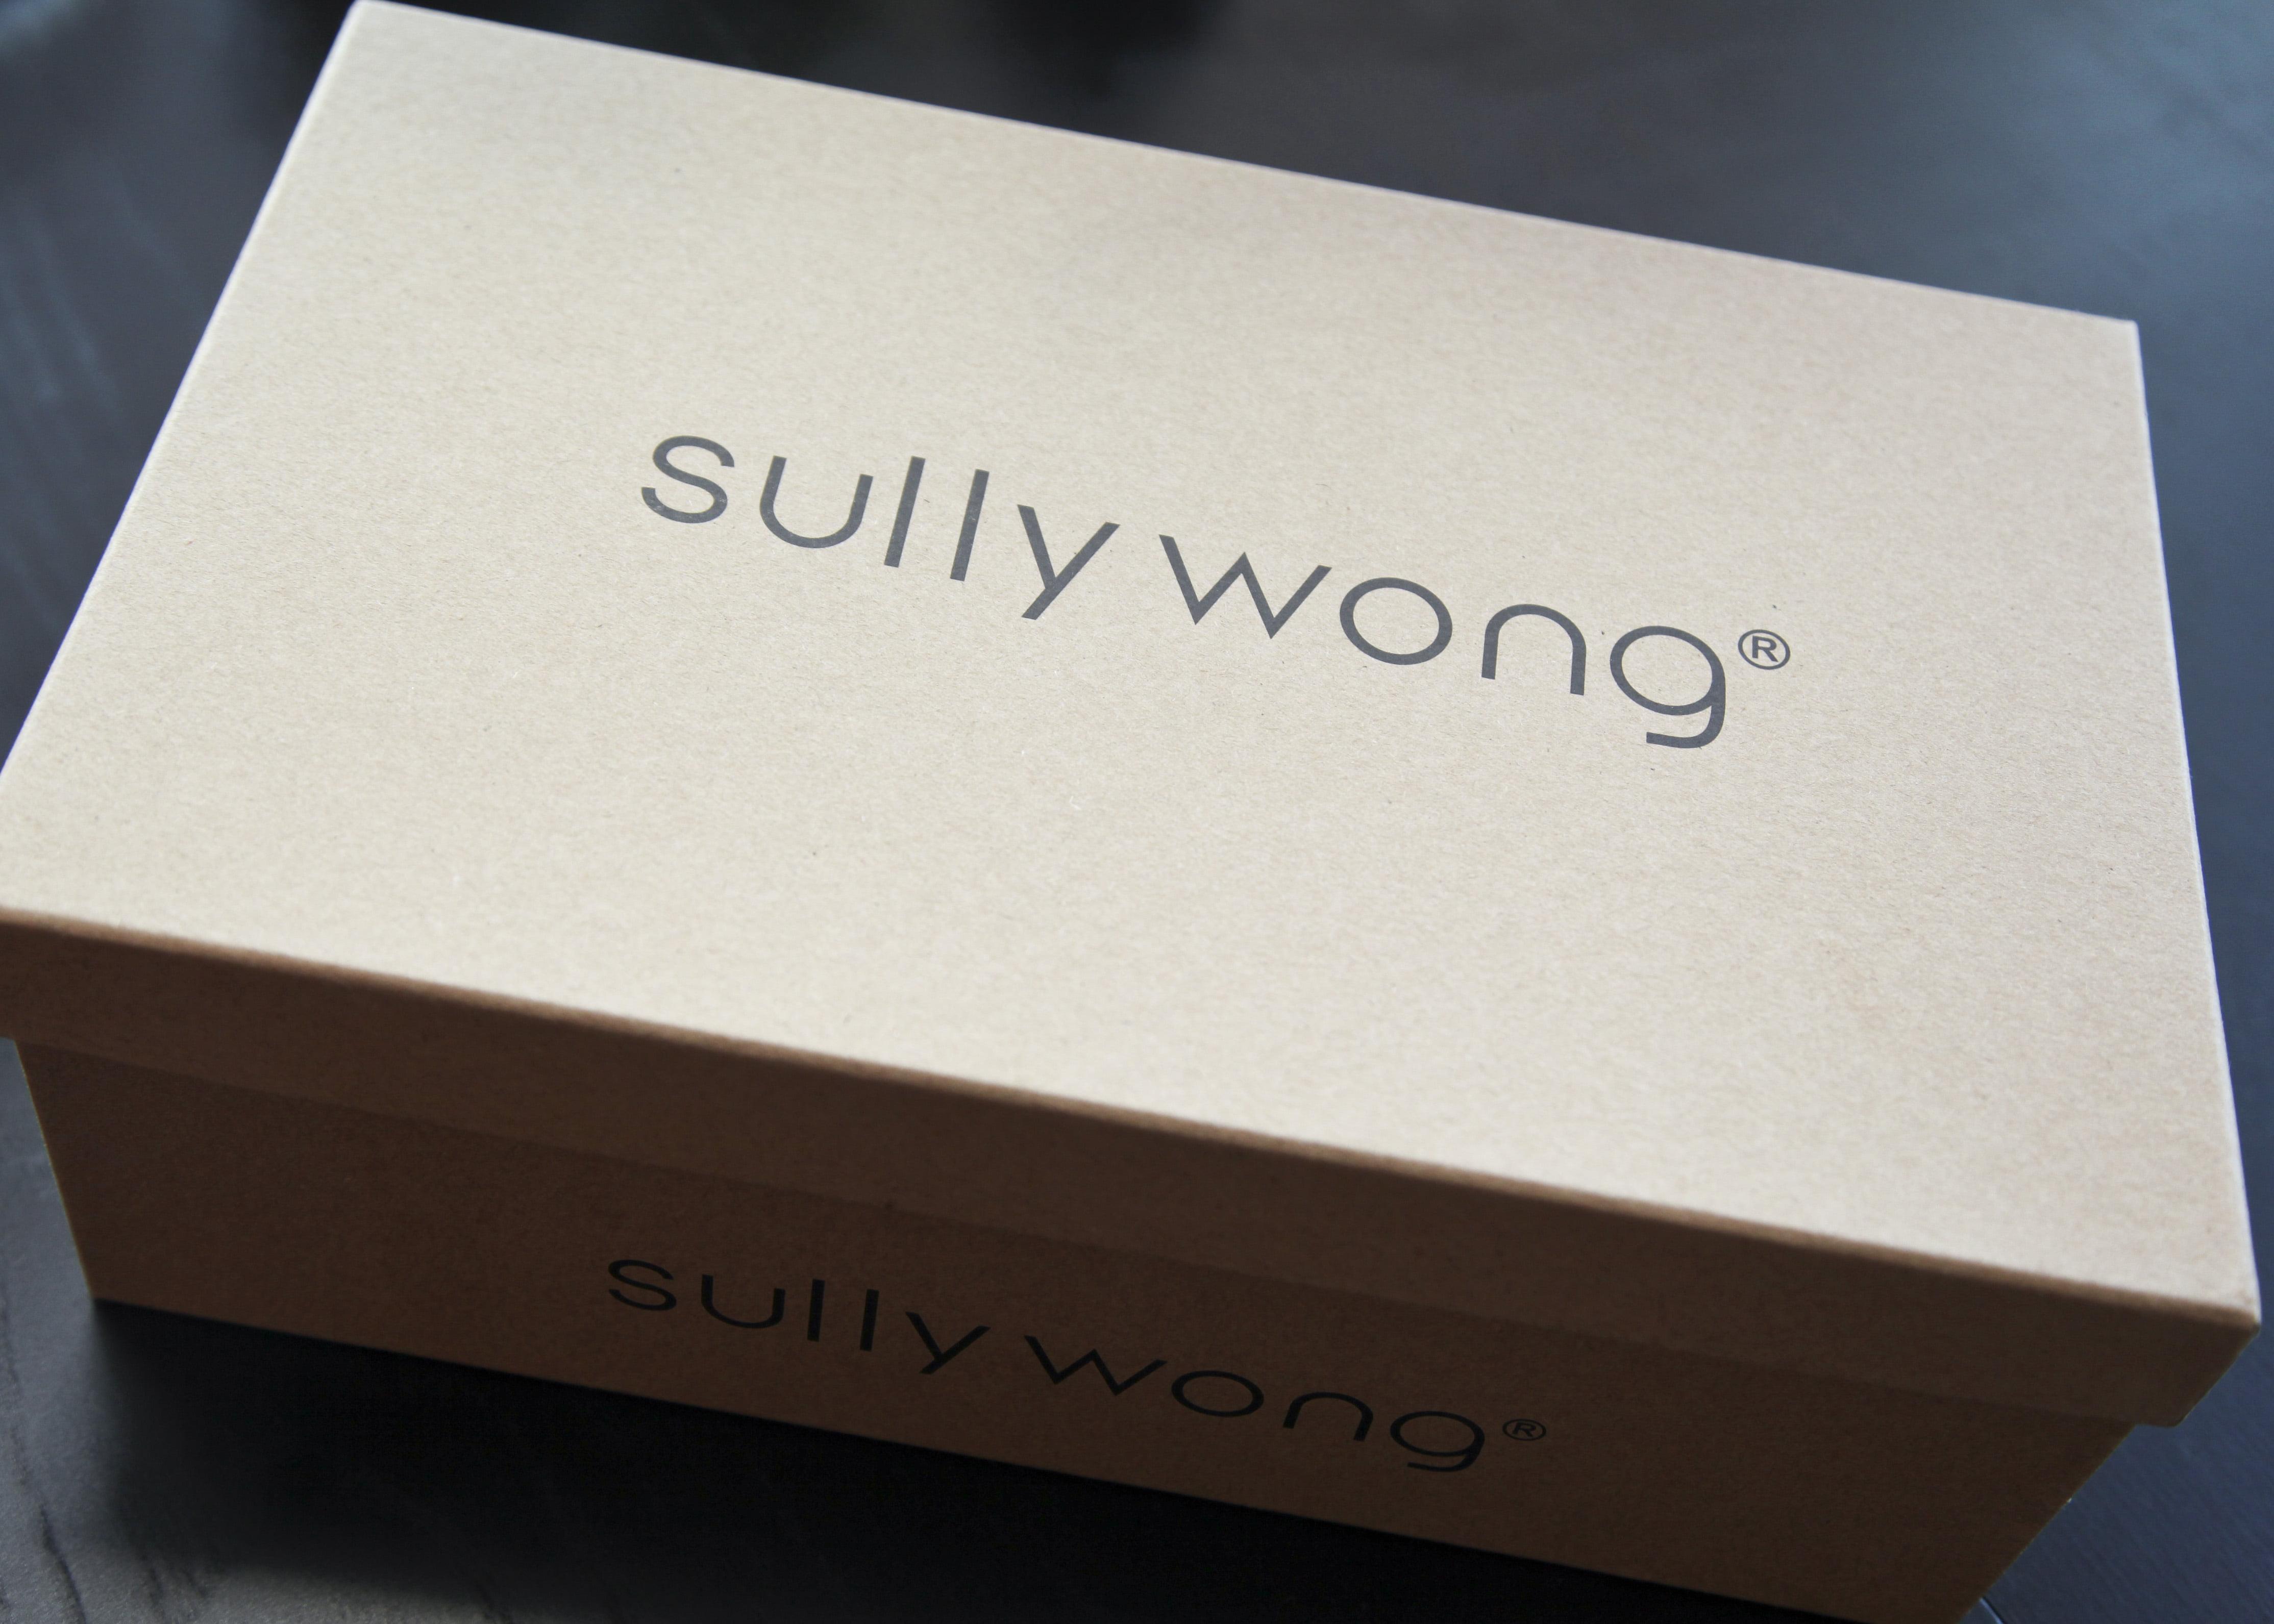 Sully Wong sneaker box